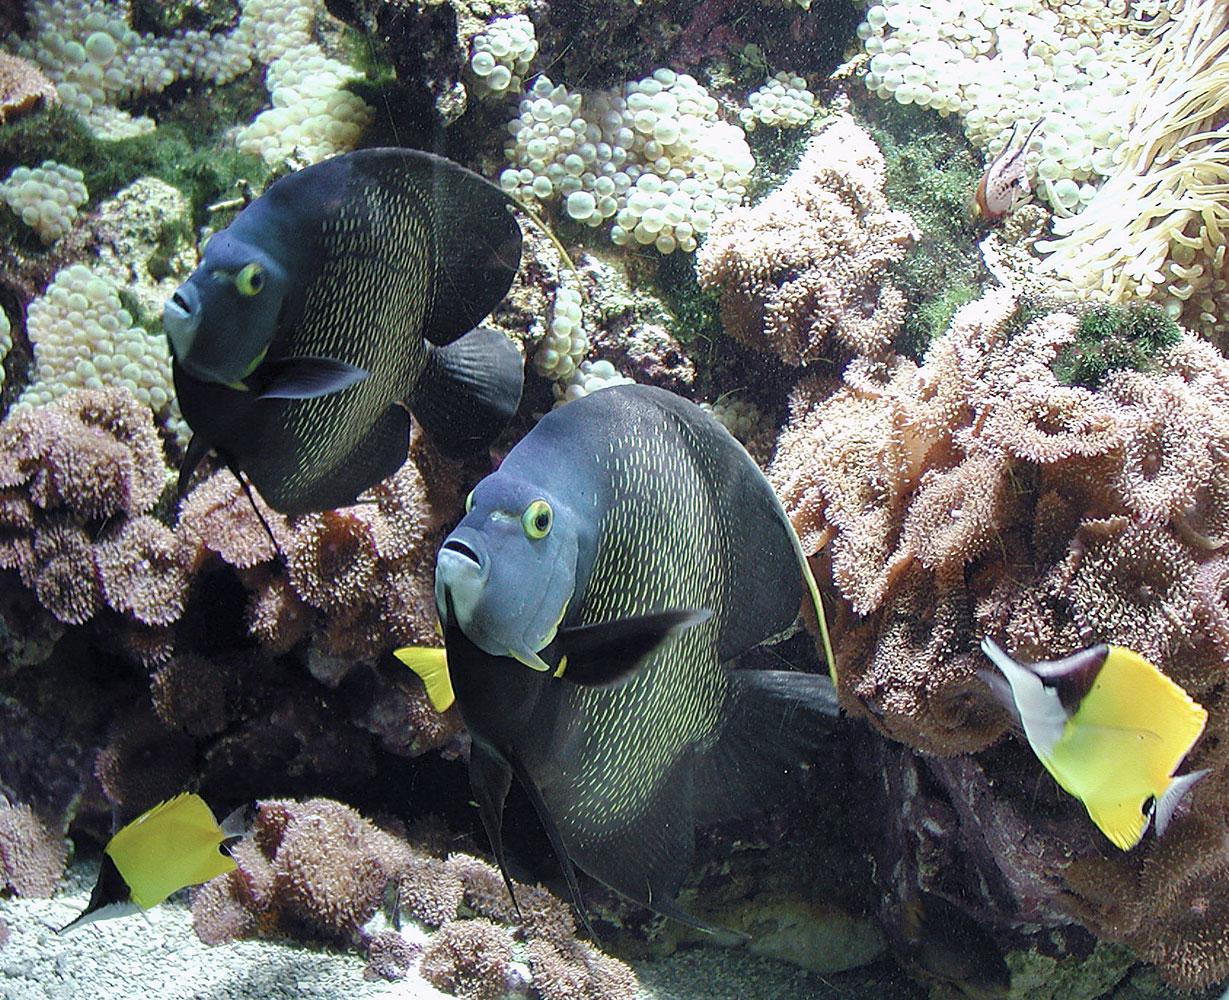 Famiglia Pomacanthidae - Pomacanthus paru